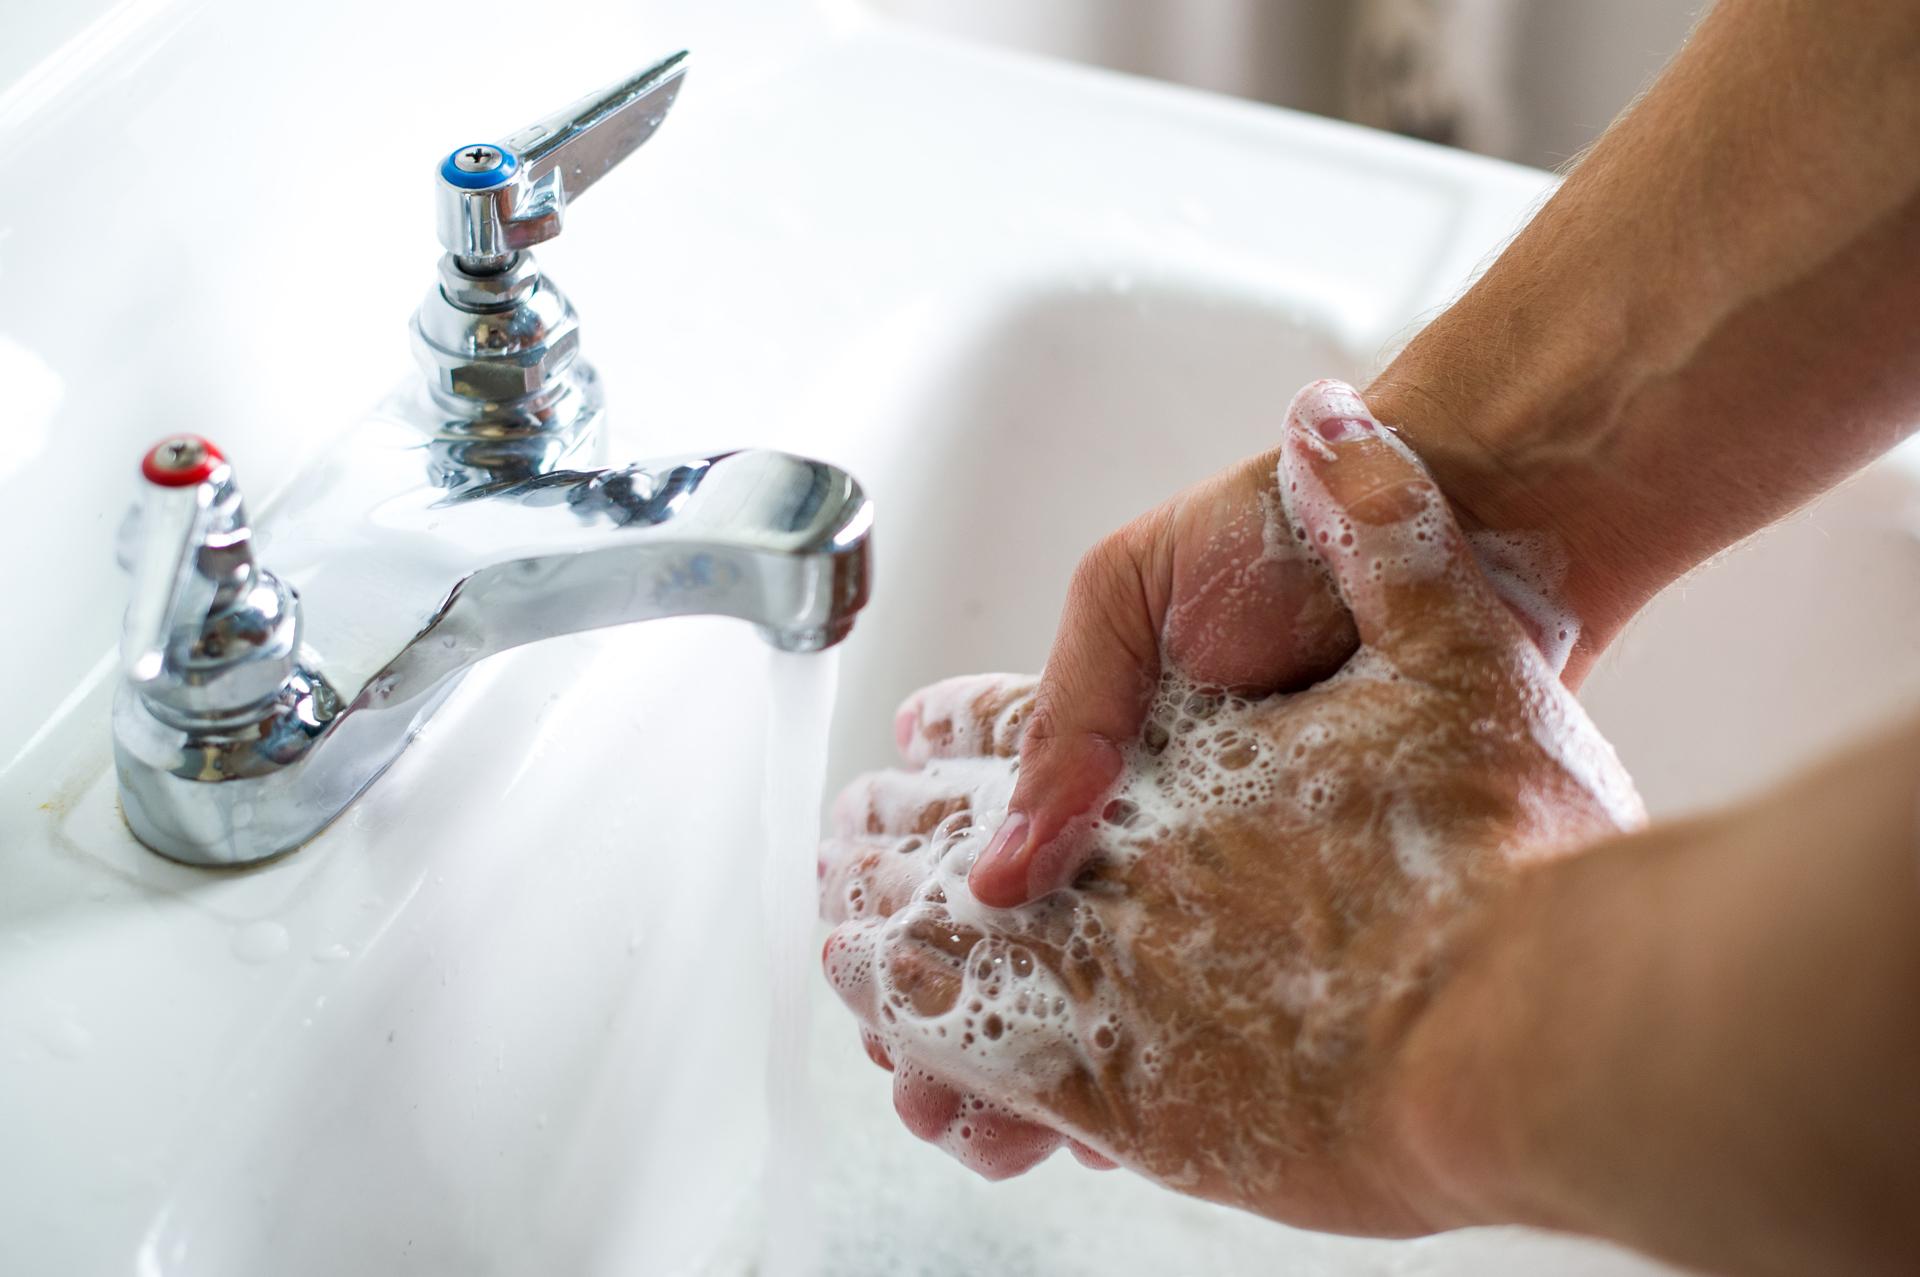 hand-washing-photo